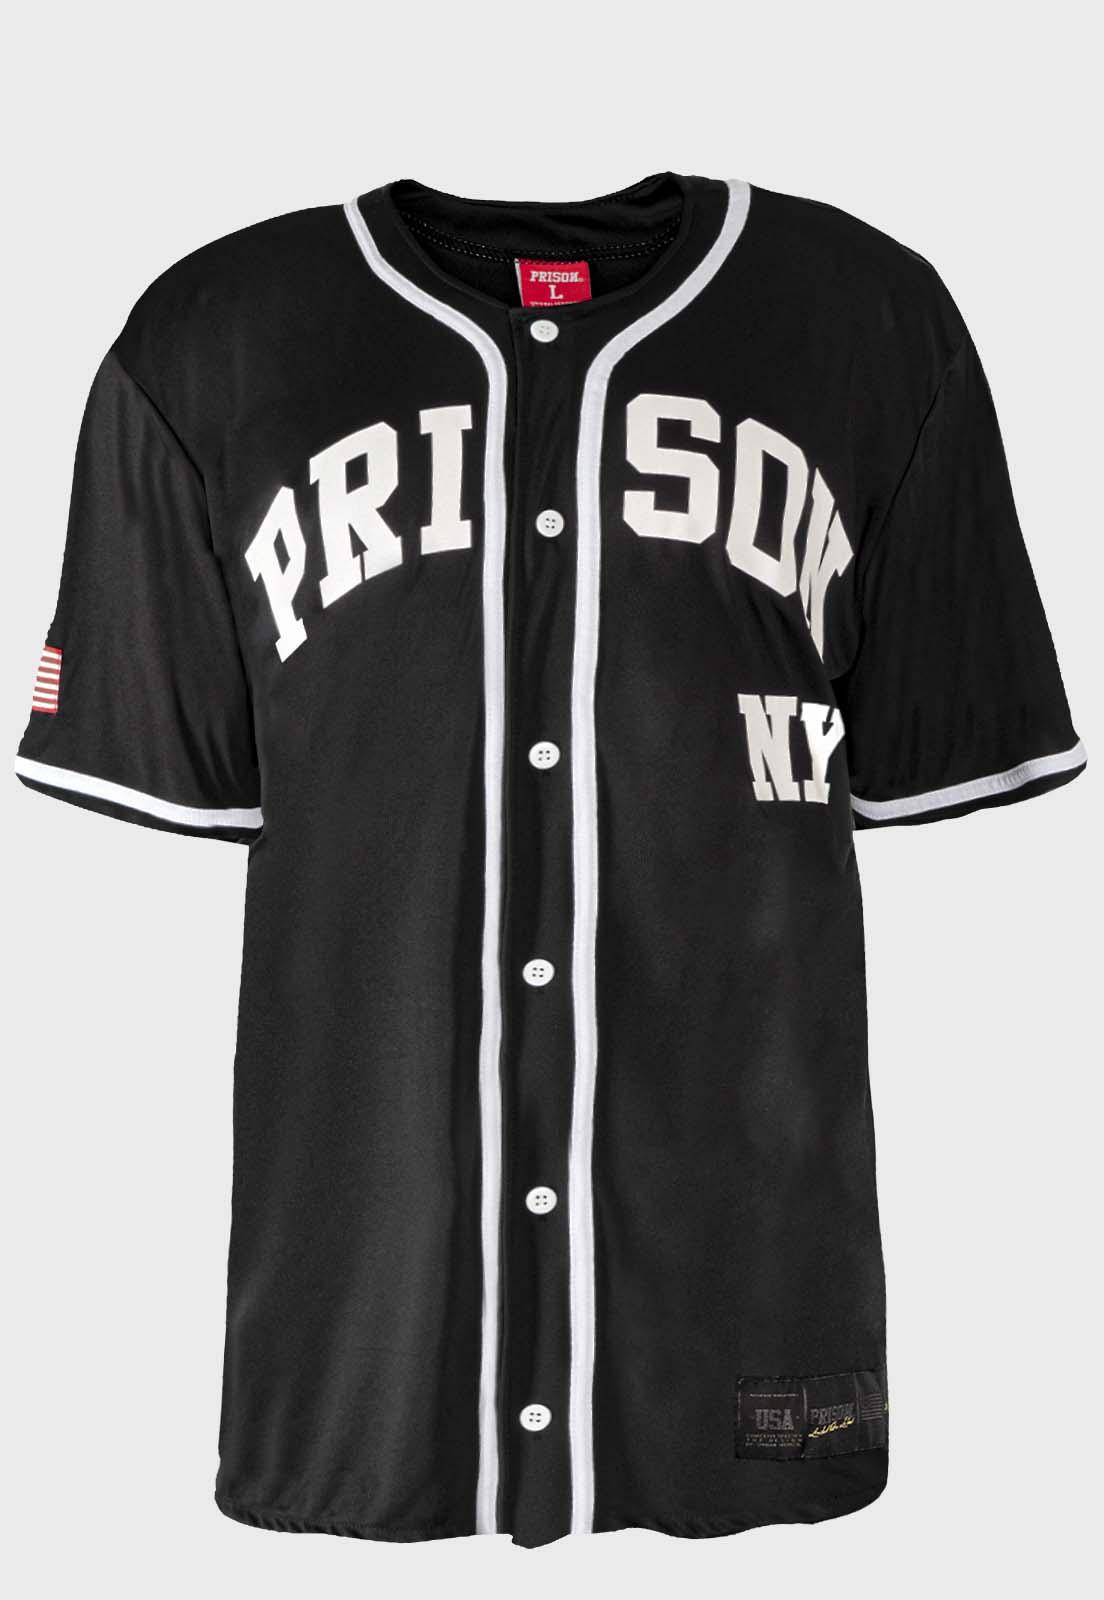 Camisa de Baseball Prison New League yorks